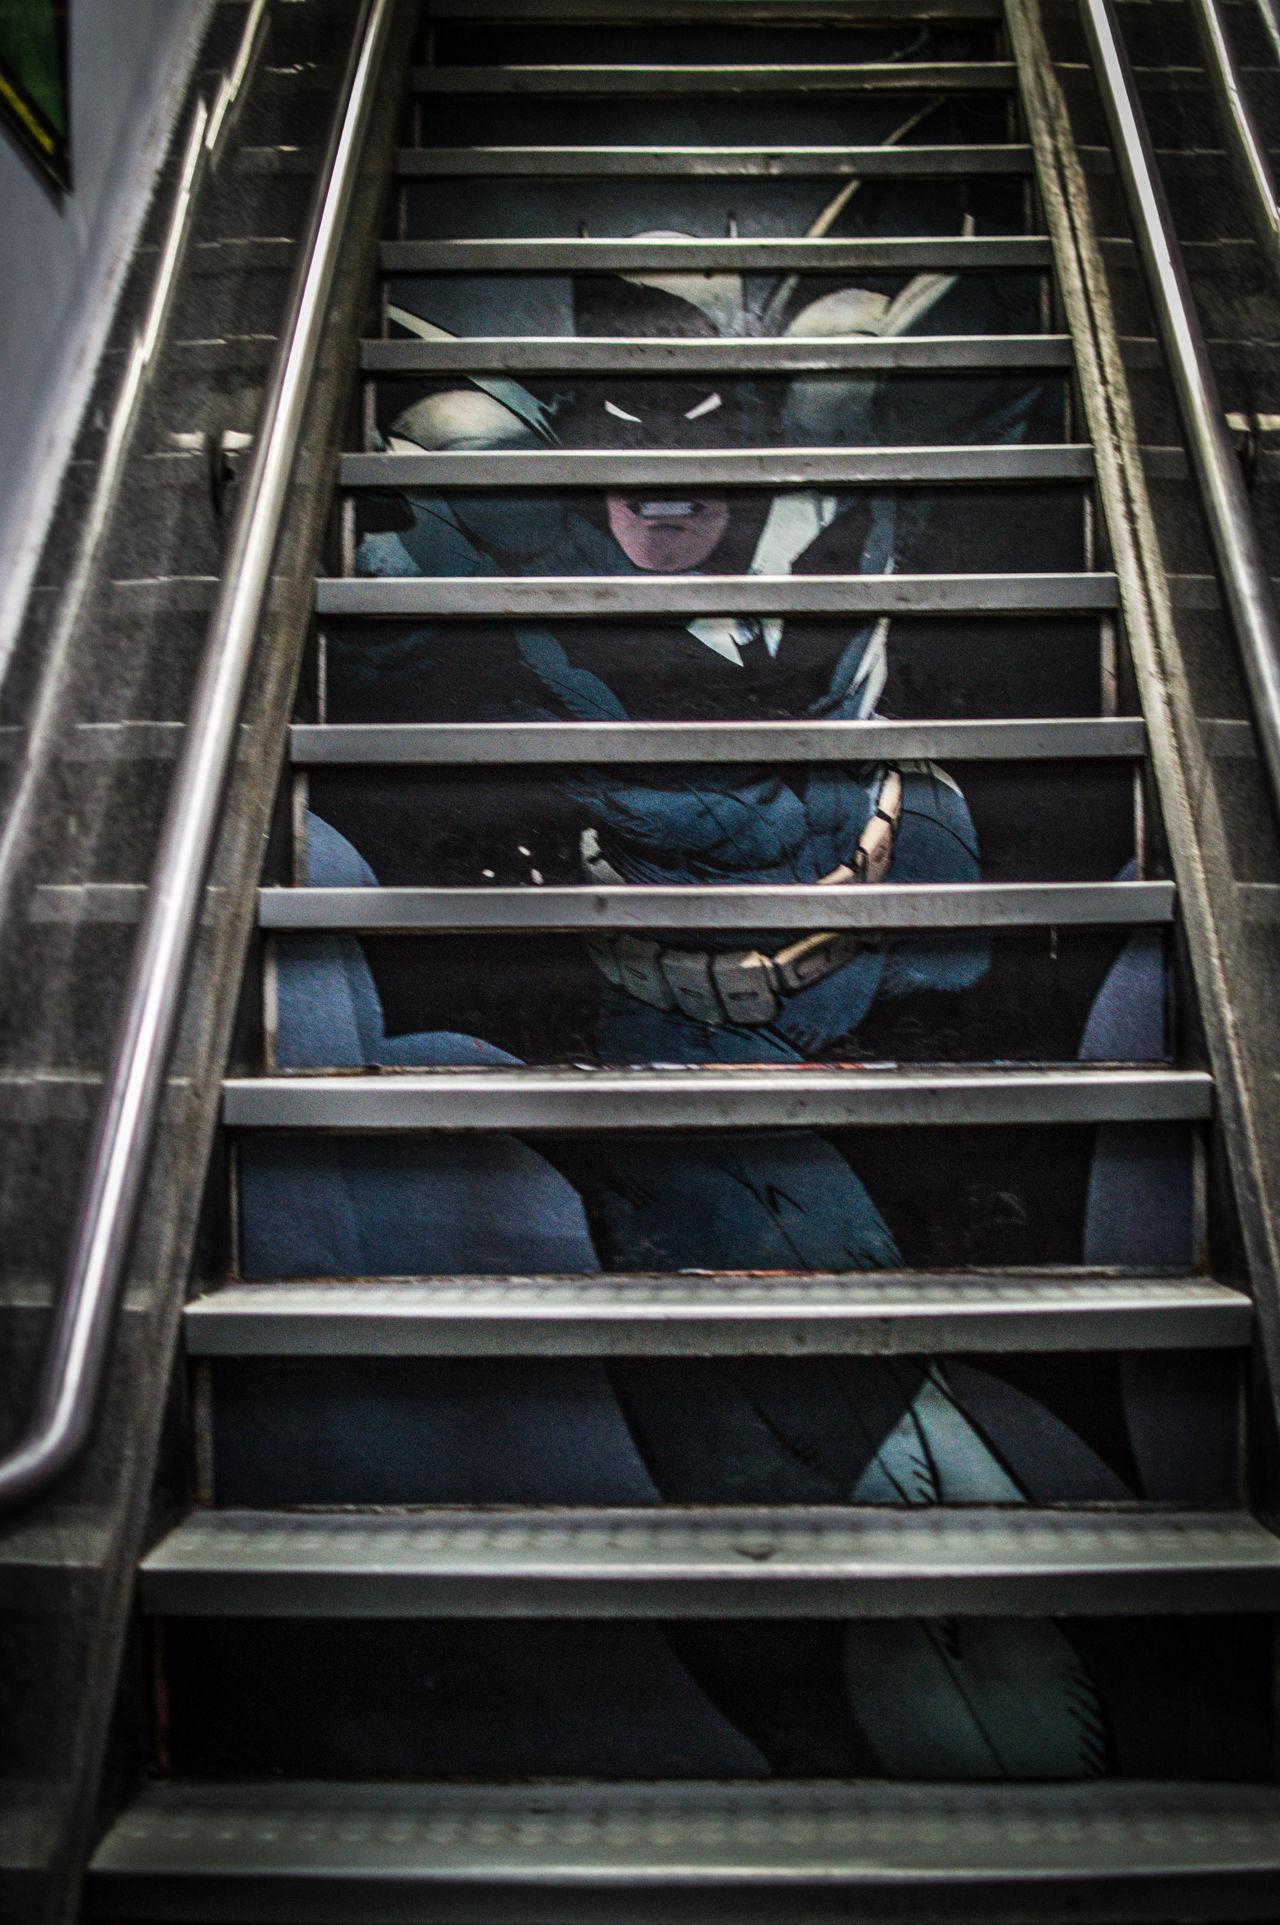 Batman Brucewayne Comics DC DC Comics DC Comics Superheroes Manhattan New York No People Railing Staircase Steps Superheroes